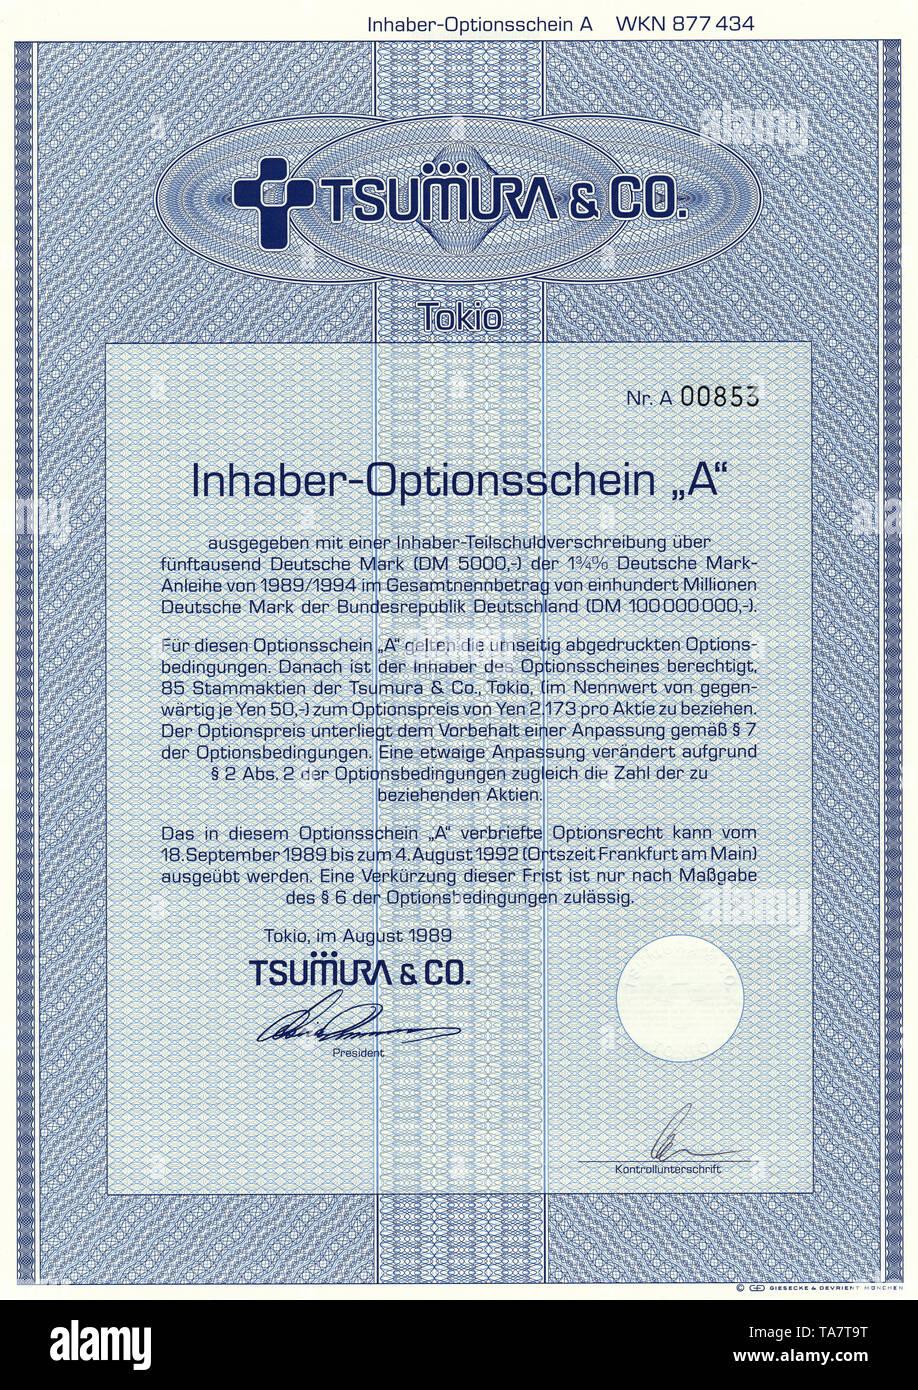 Historic stock certificate, Securities certificate, bearer warrant, Wertpapier, Inhaber-Optionsschein, japanische Yen, Deutsche Mark, Pharmaunternehmen, Tsumura & Co., 1989, Tokio, Japan, Asien - Stock Image